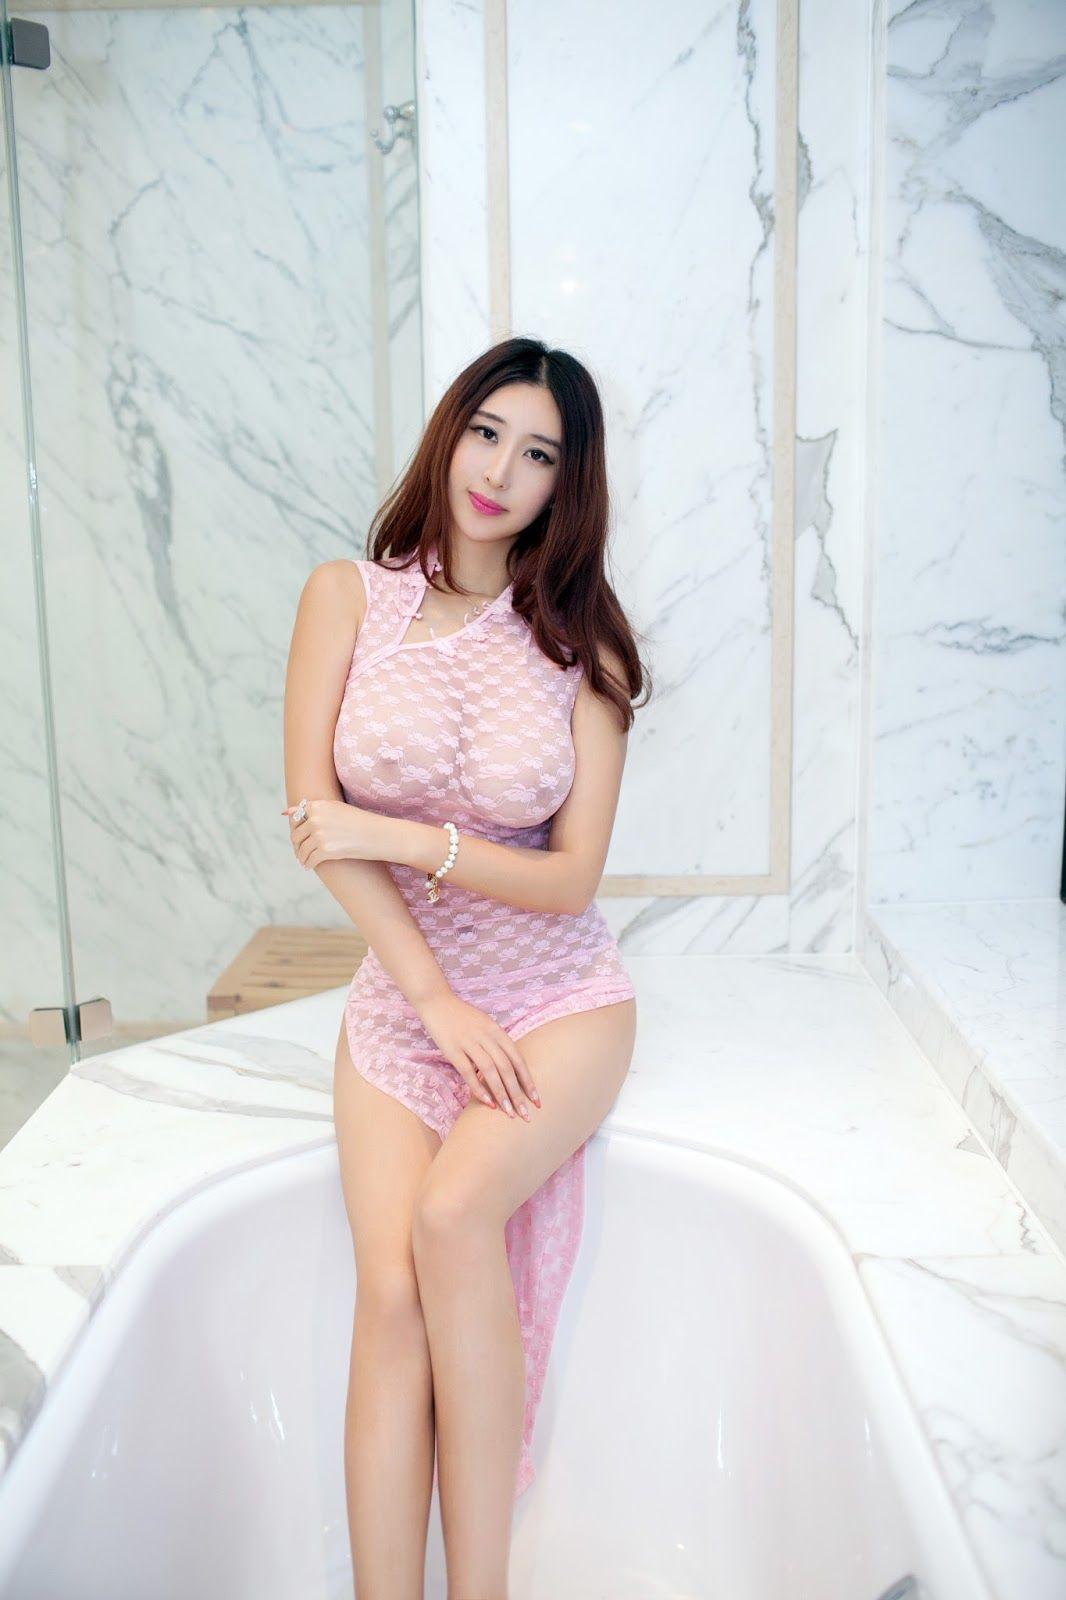 Jpg   lang dealessi  Pinterest  Asian and Girls